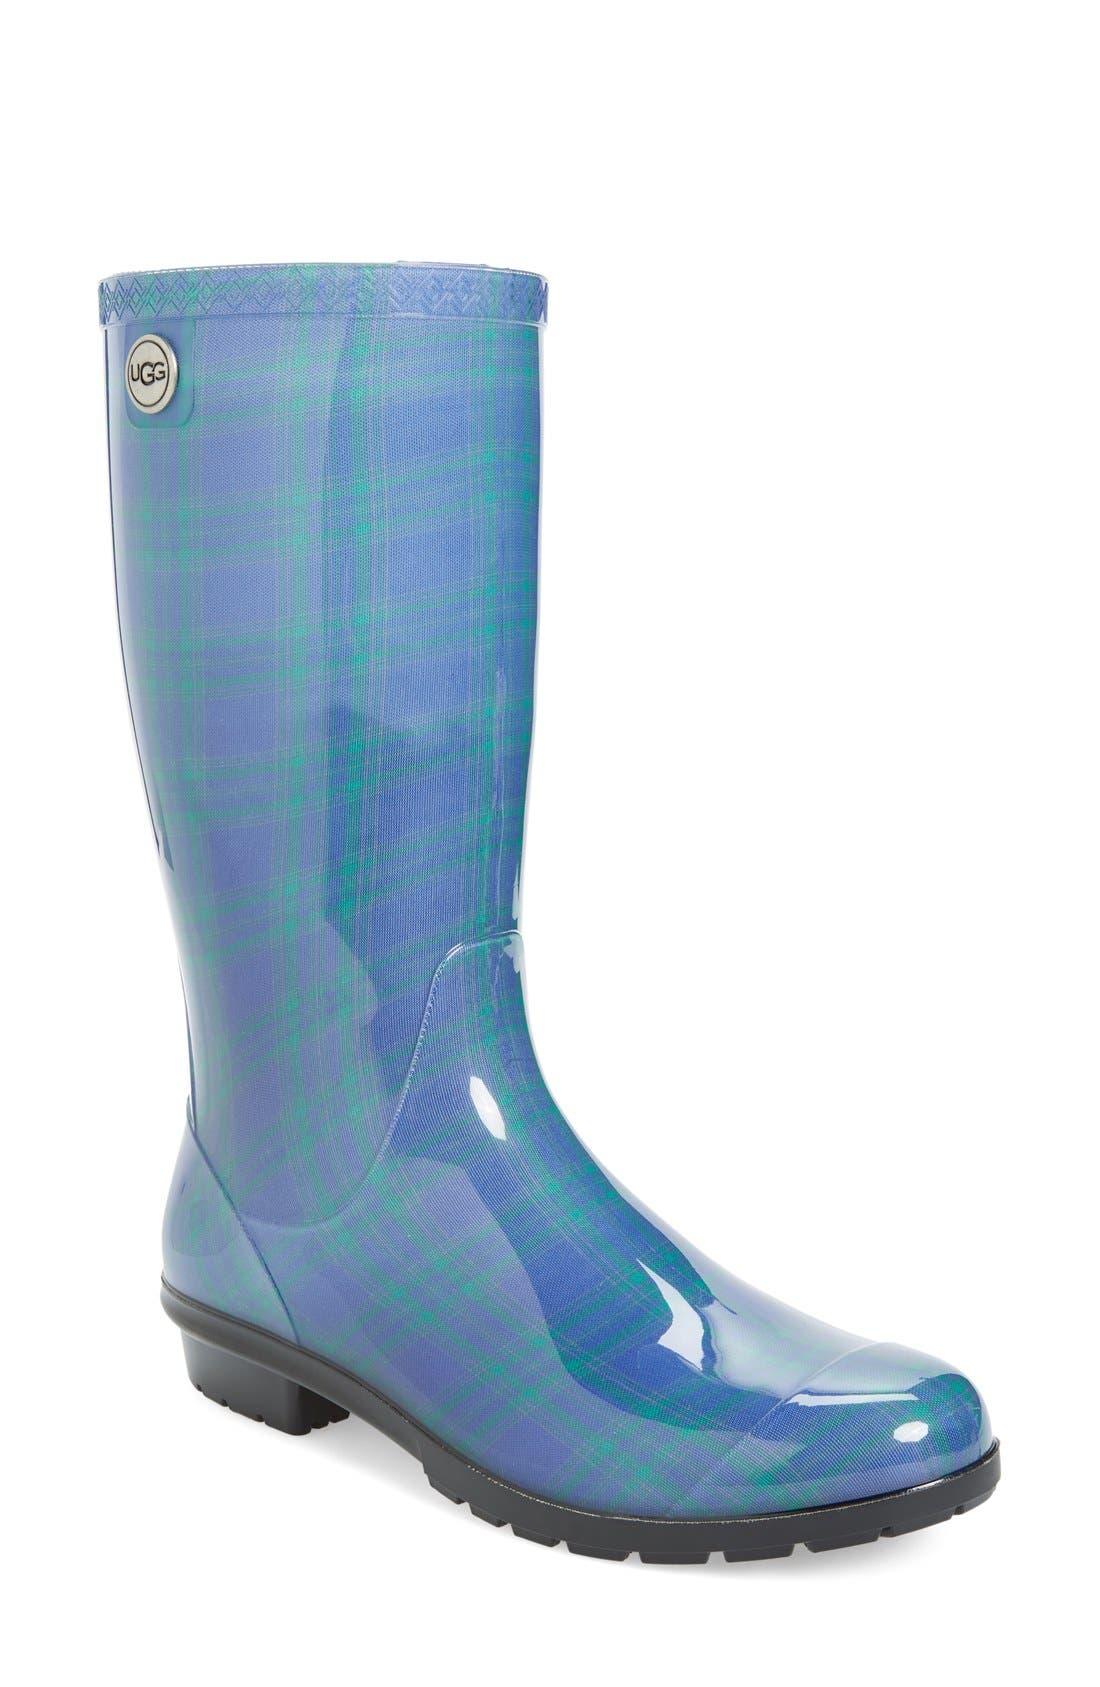 Main Image - UGG® 'Shaye' Genuine Shearling Lined Waterproof Mid-Calf Rain Boot (Women)